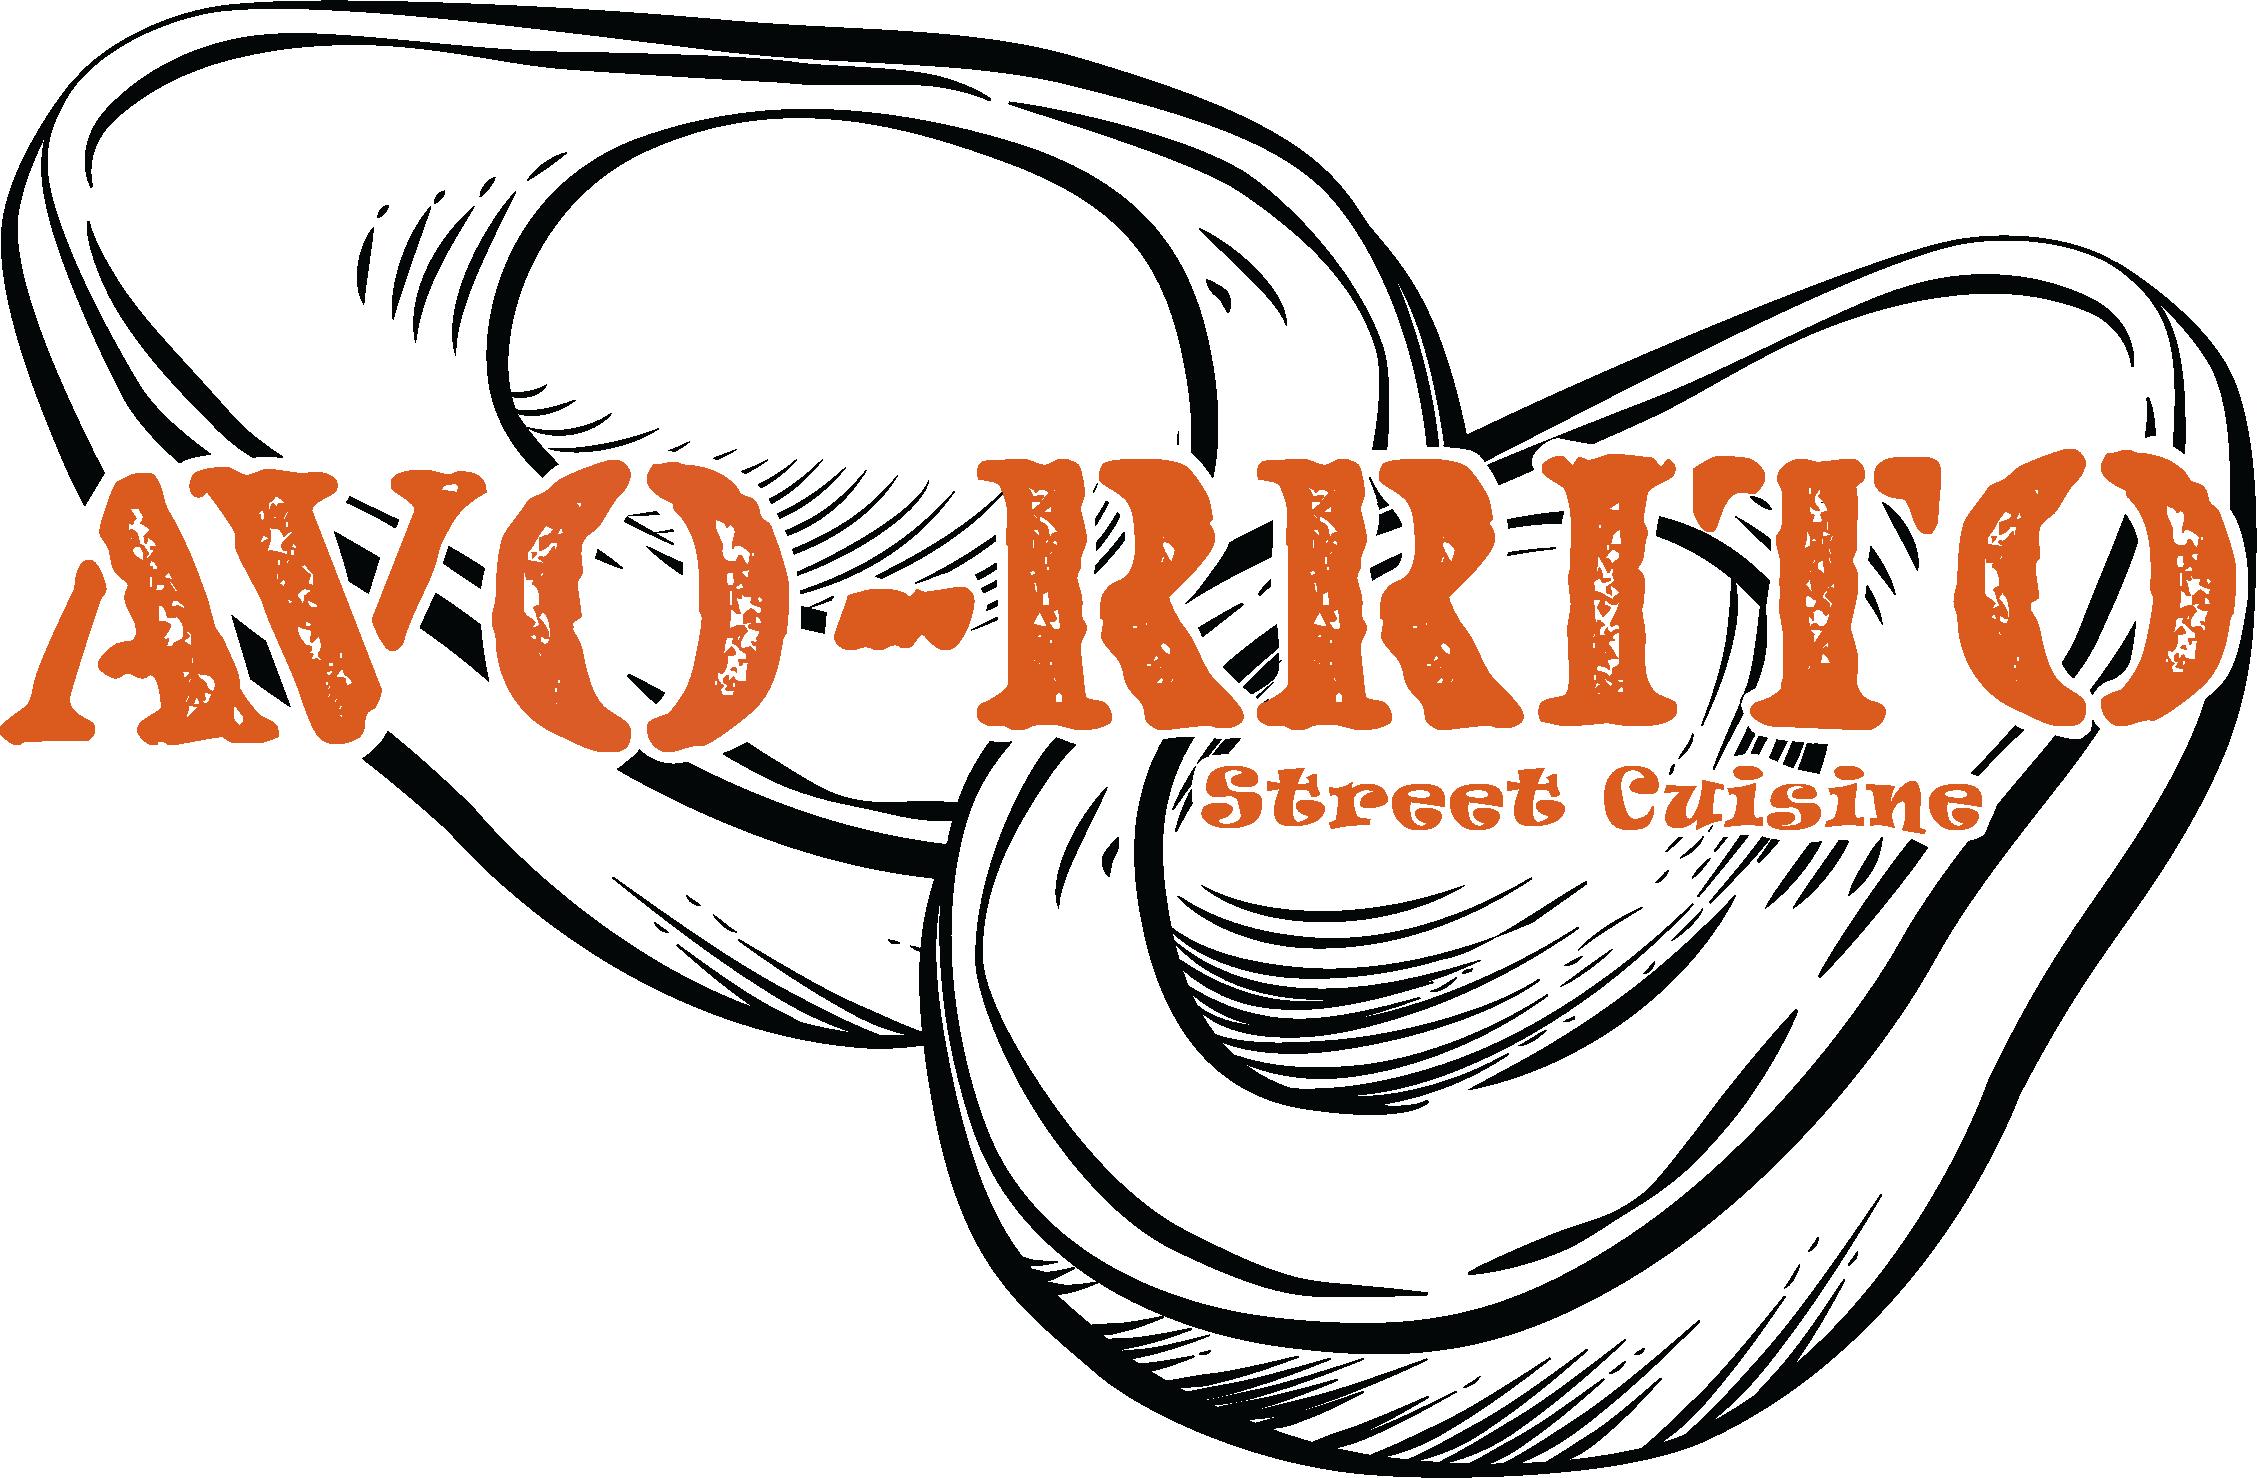 Avo-rrito Logo_Avocado.png